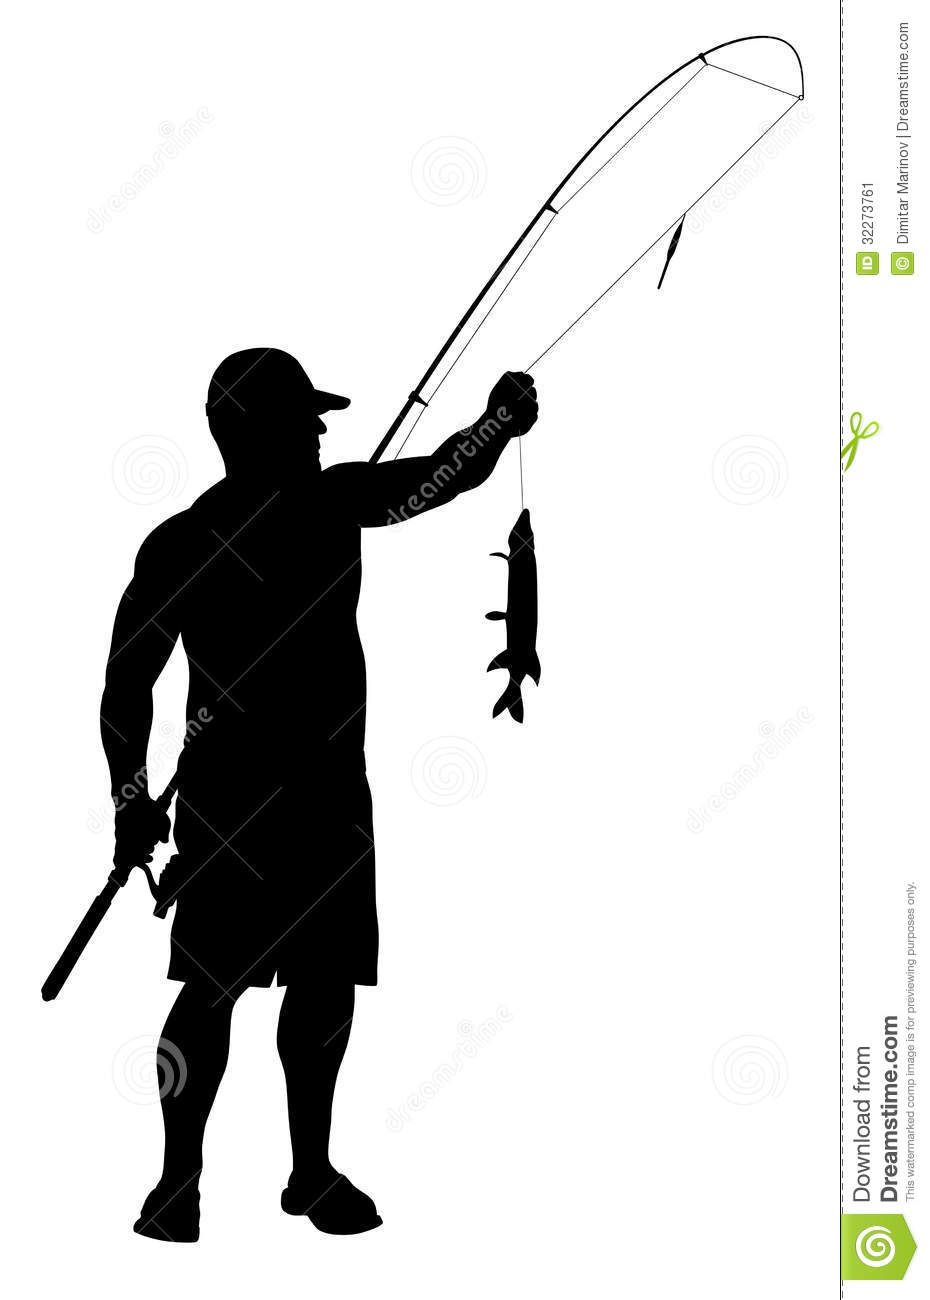 Download Man Fishing Silhouette Clipart Panda Free Clipart Images Fish Silhouette Man Fishing Silhouette Fisherman Silhouette